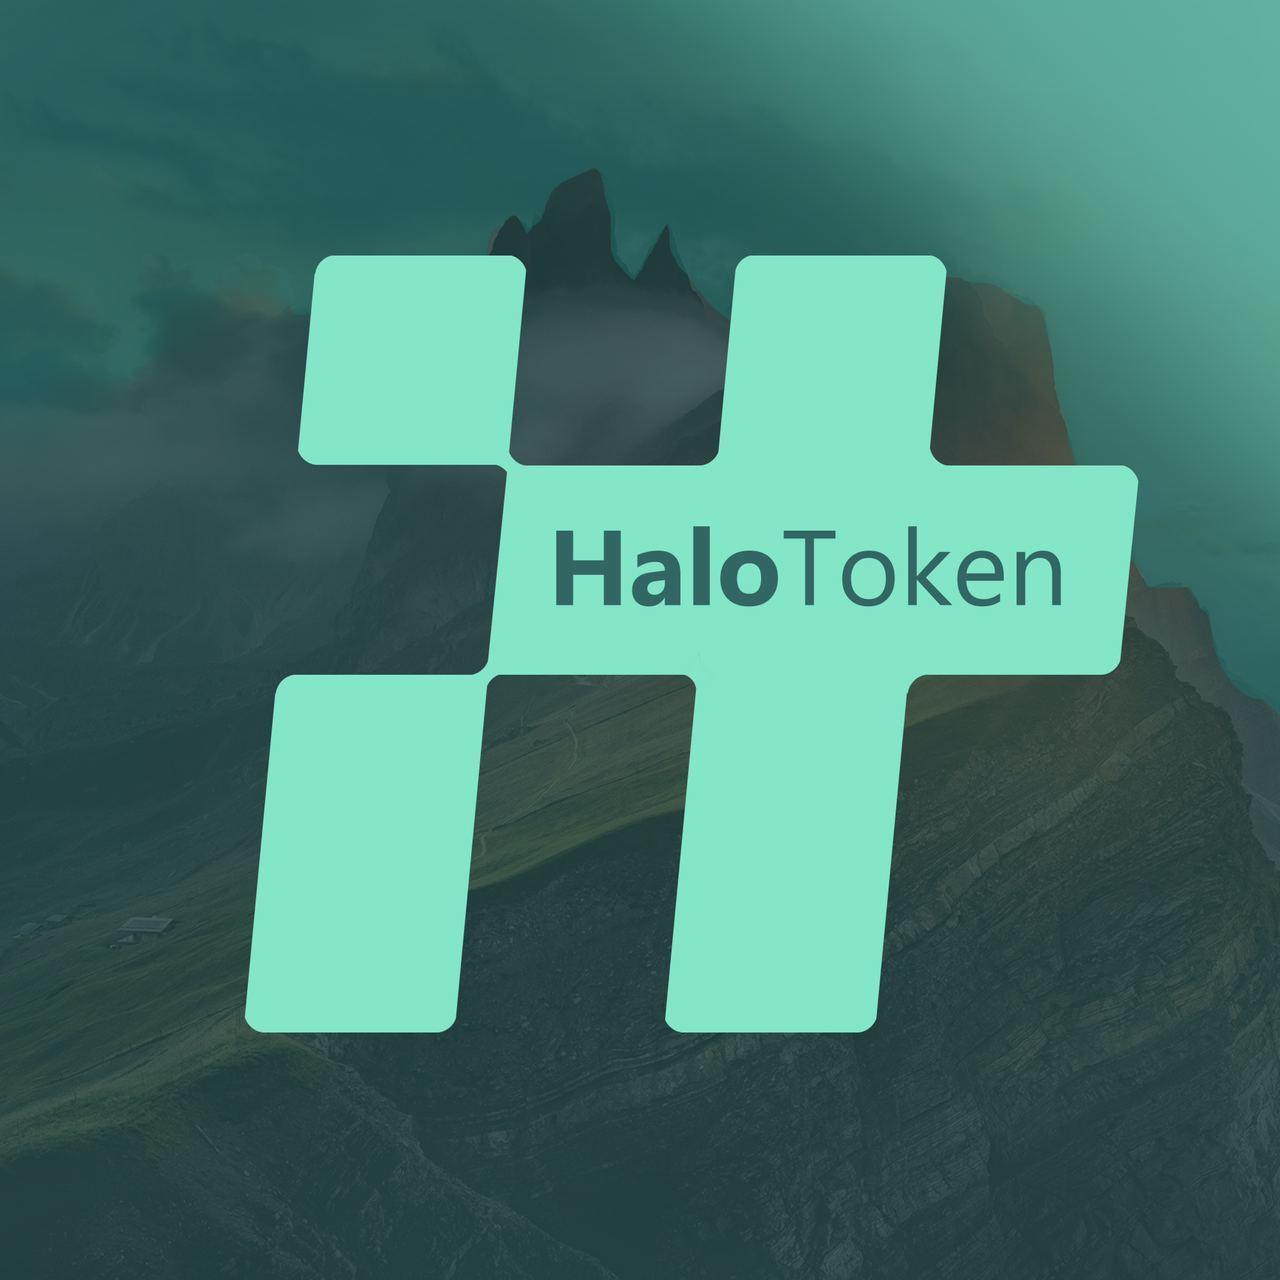 HaloToken logo